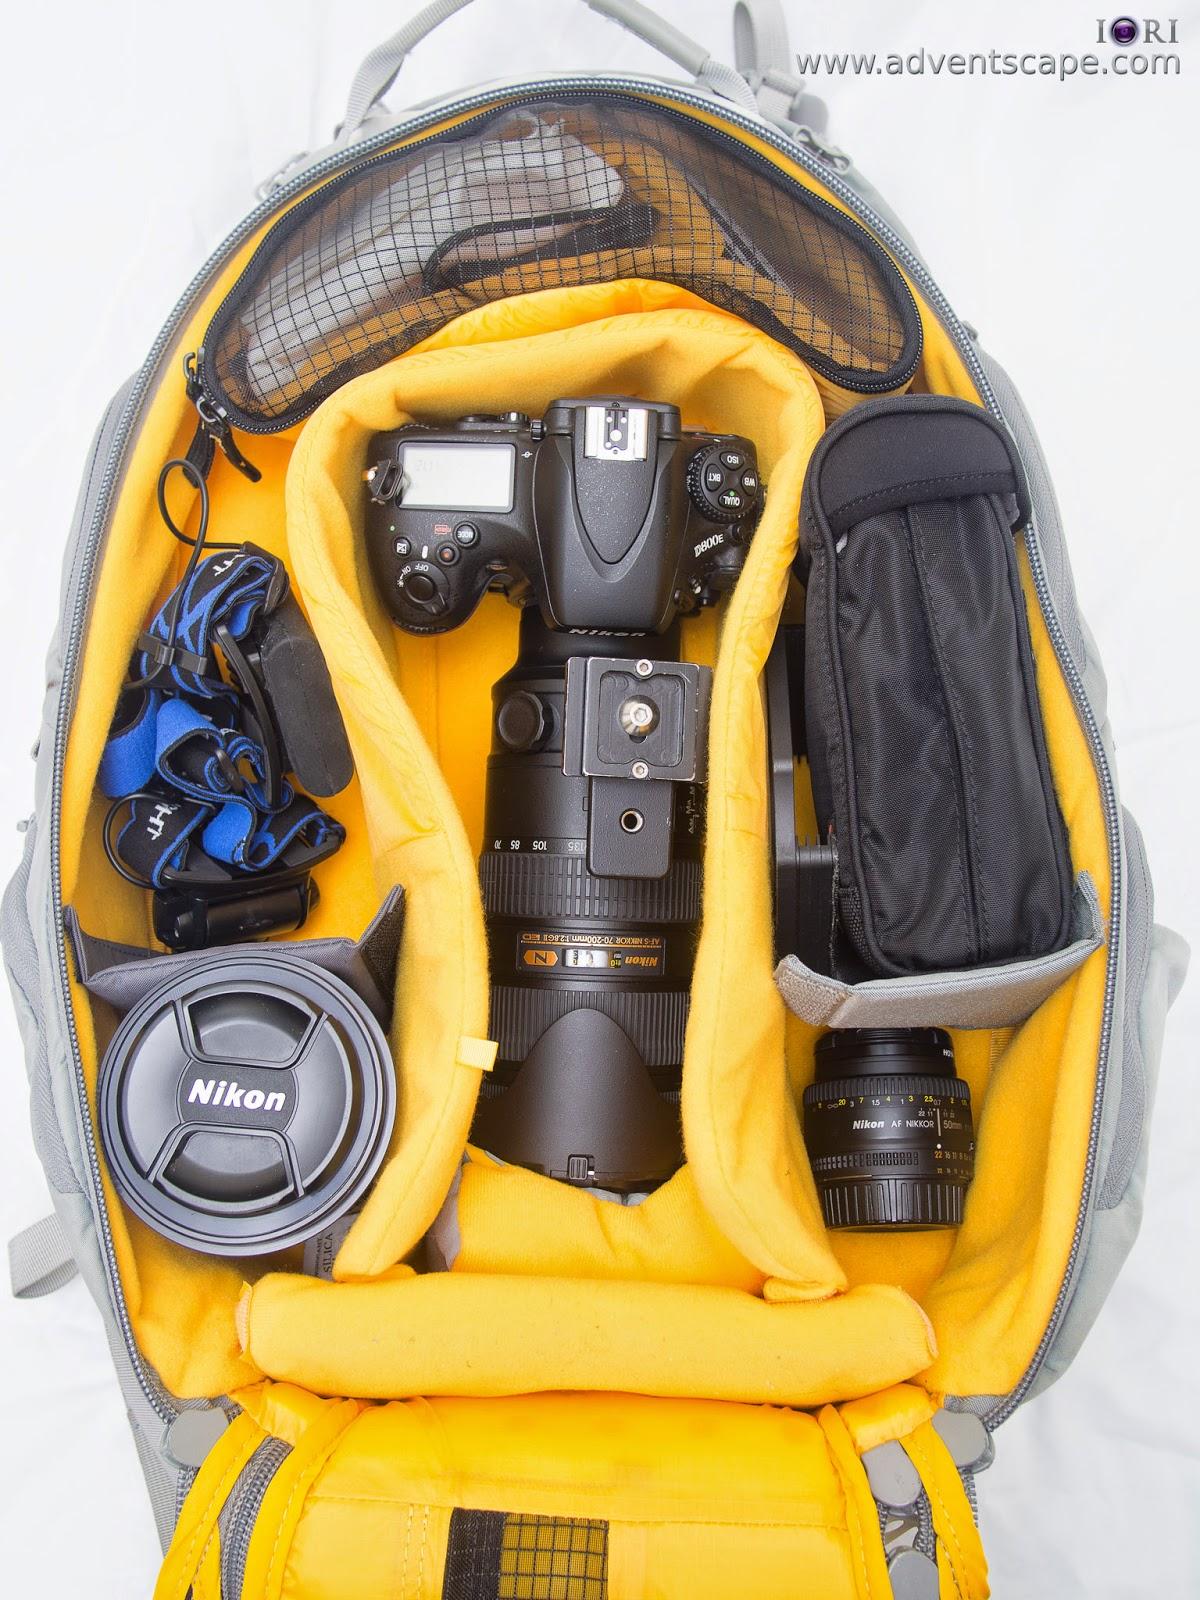 205, adventscape, Australian Landscape Photographer, bag, Bug, Kata, Manfrotto, Philip Avellana, review, accessories, pouch, strap, What's In Your Bag, landscape